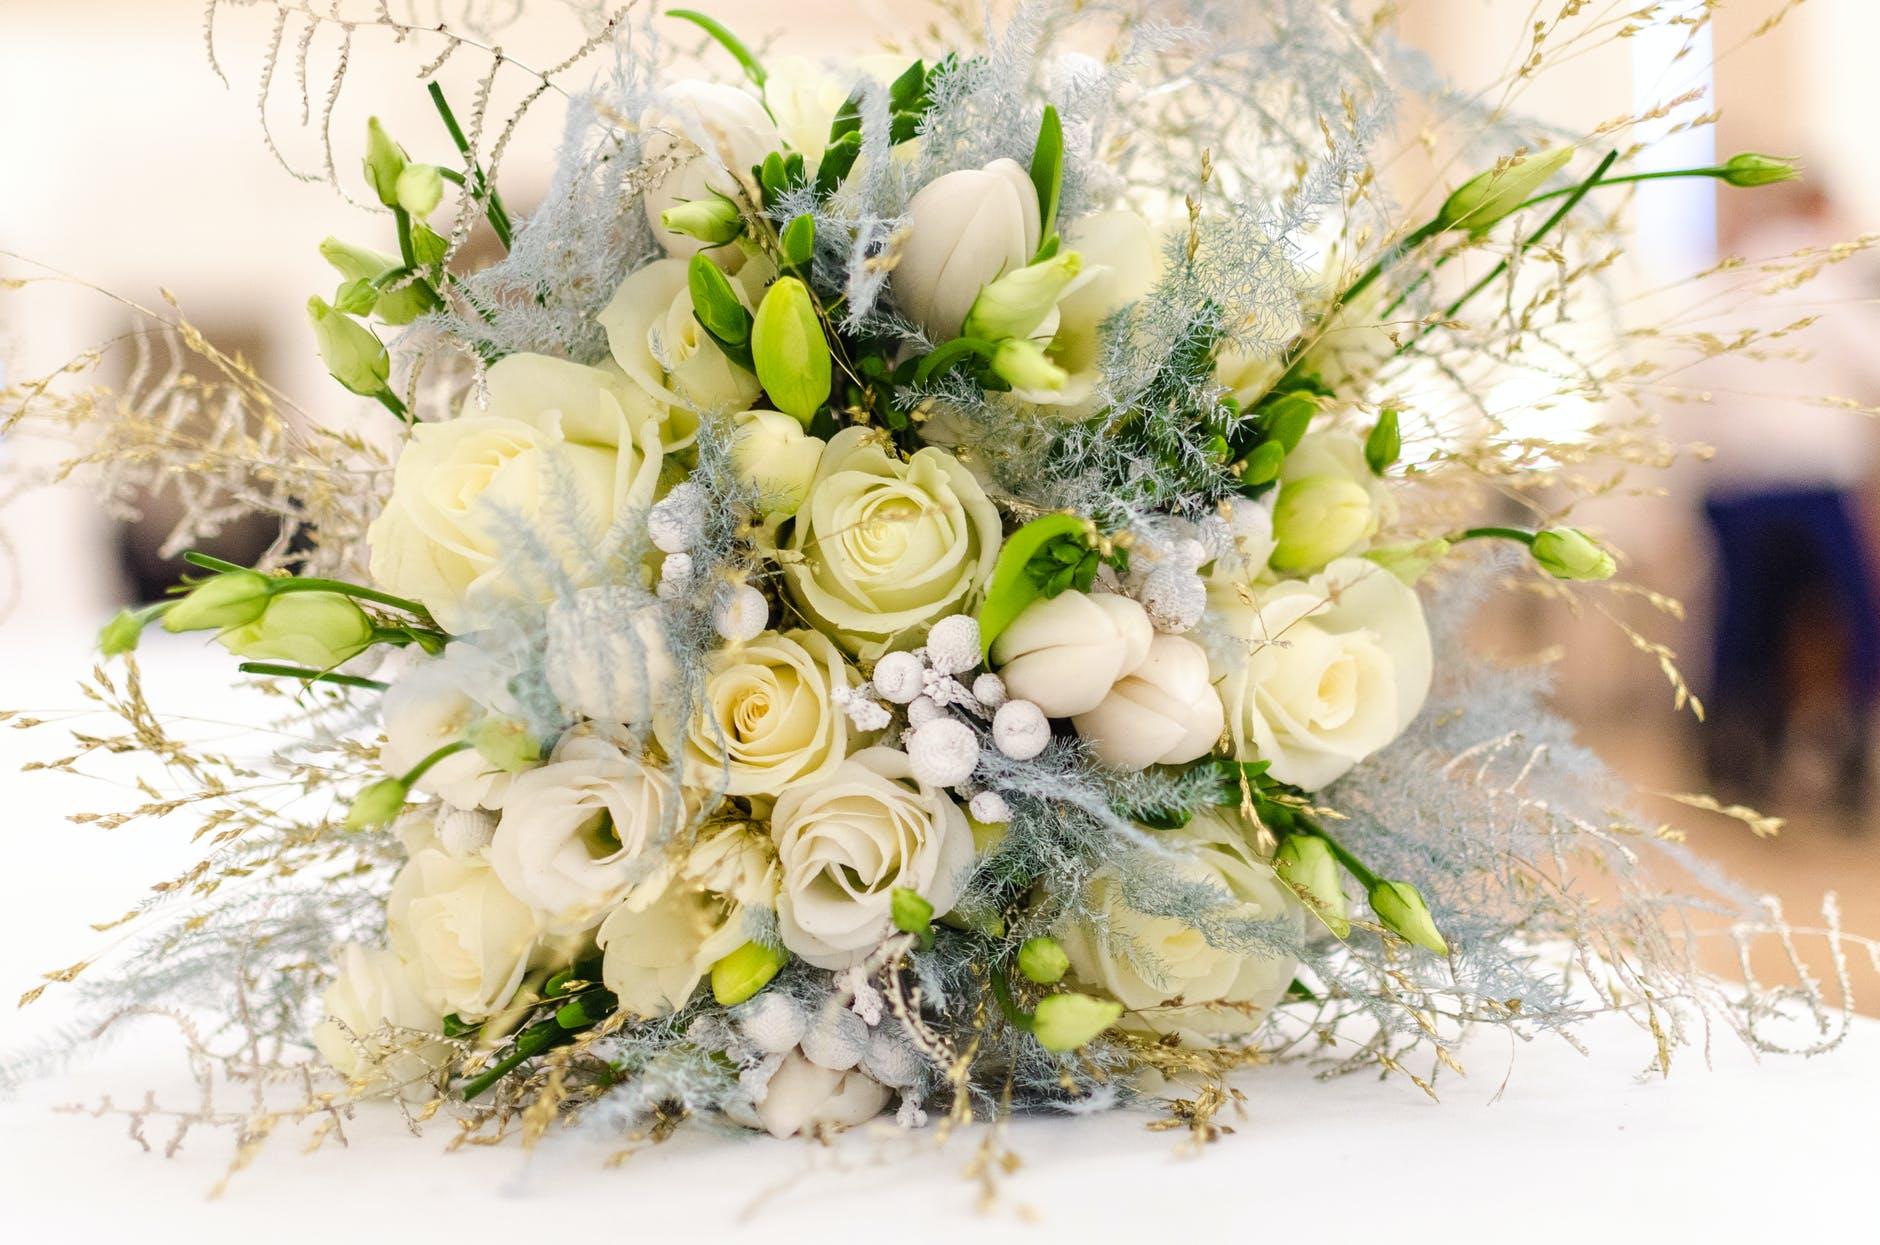 Bridal shower host etiquette